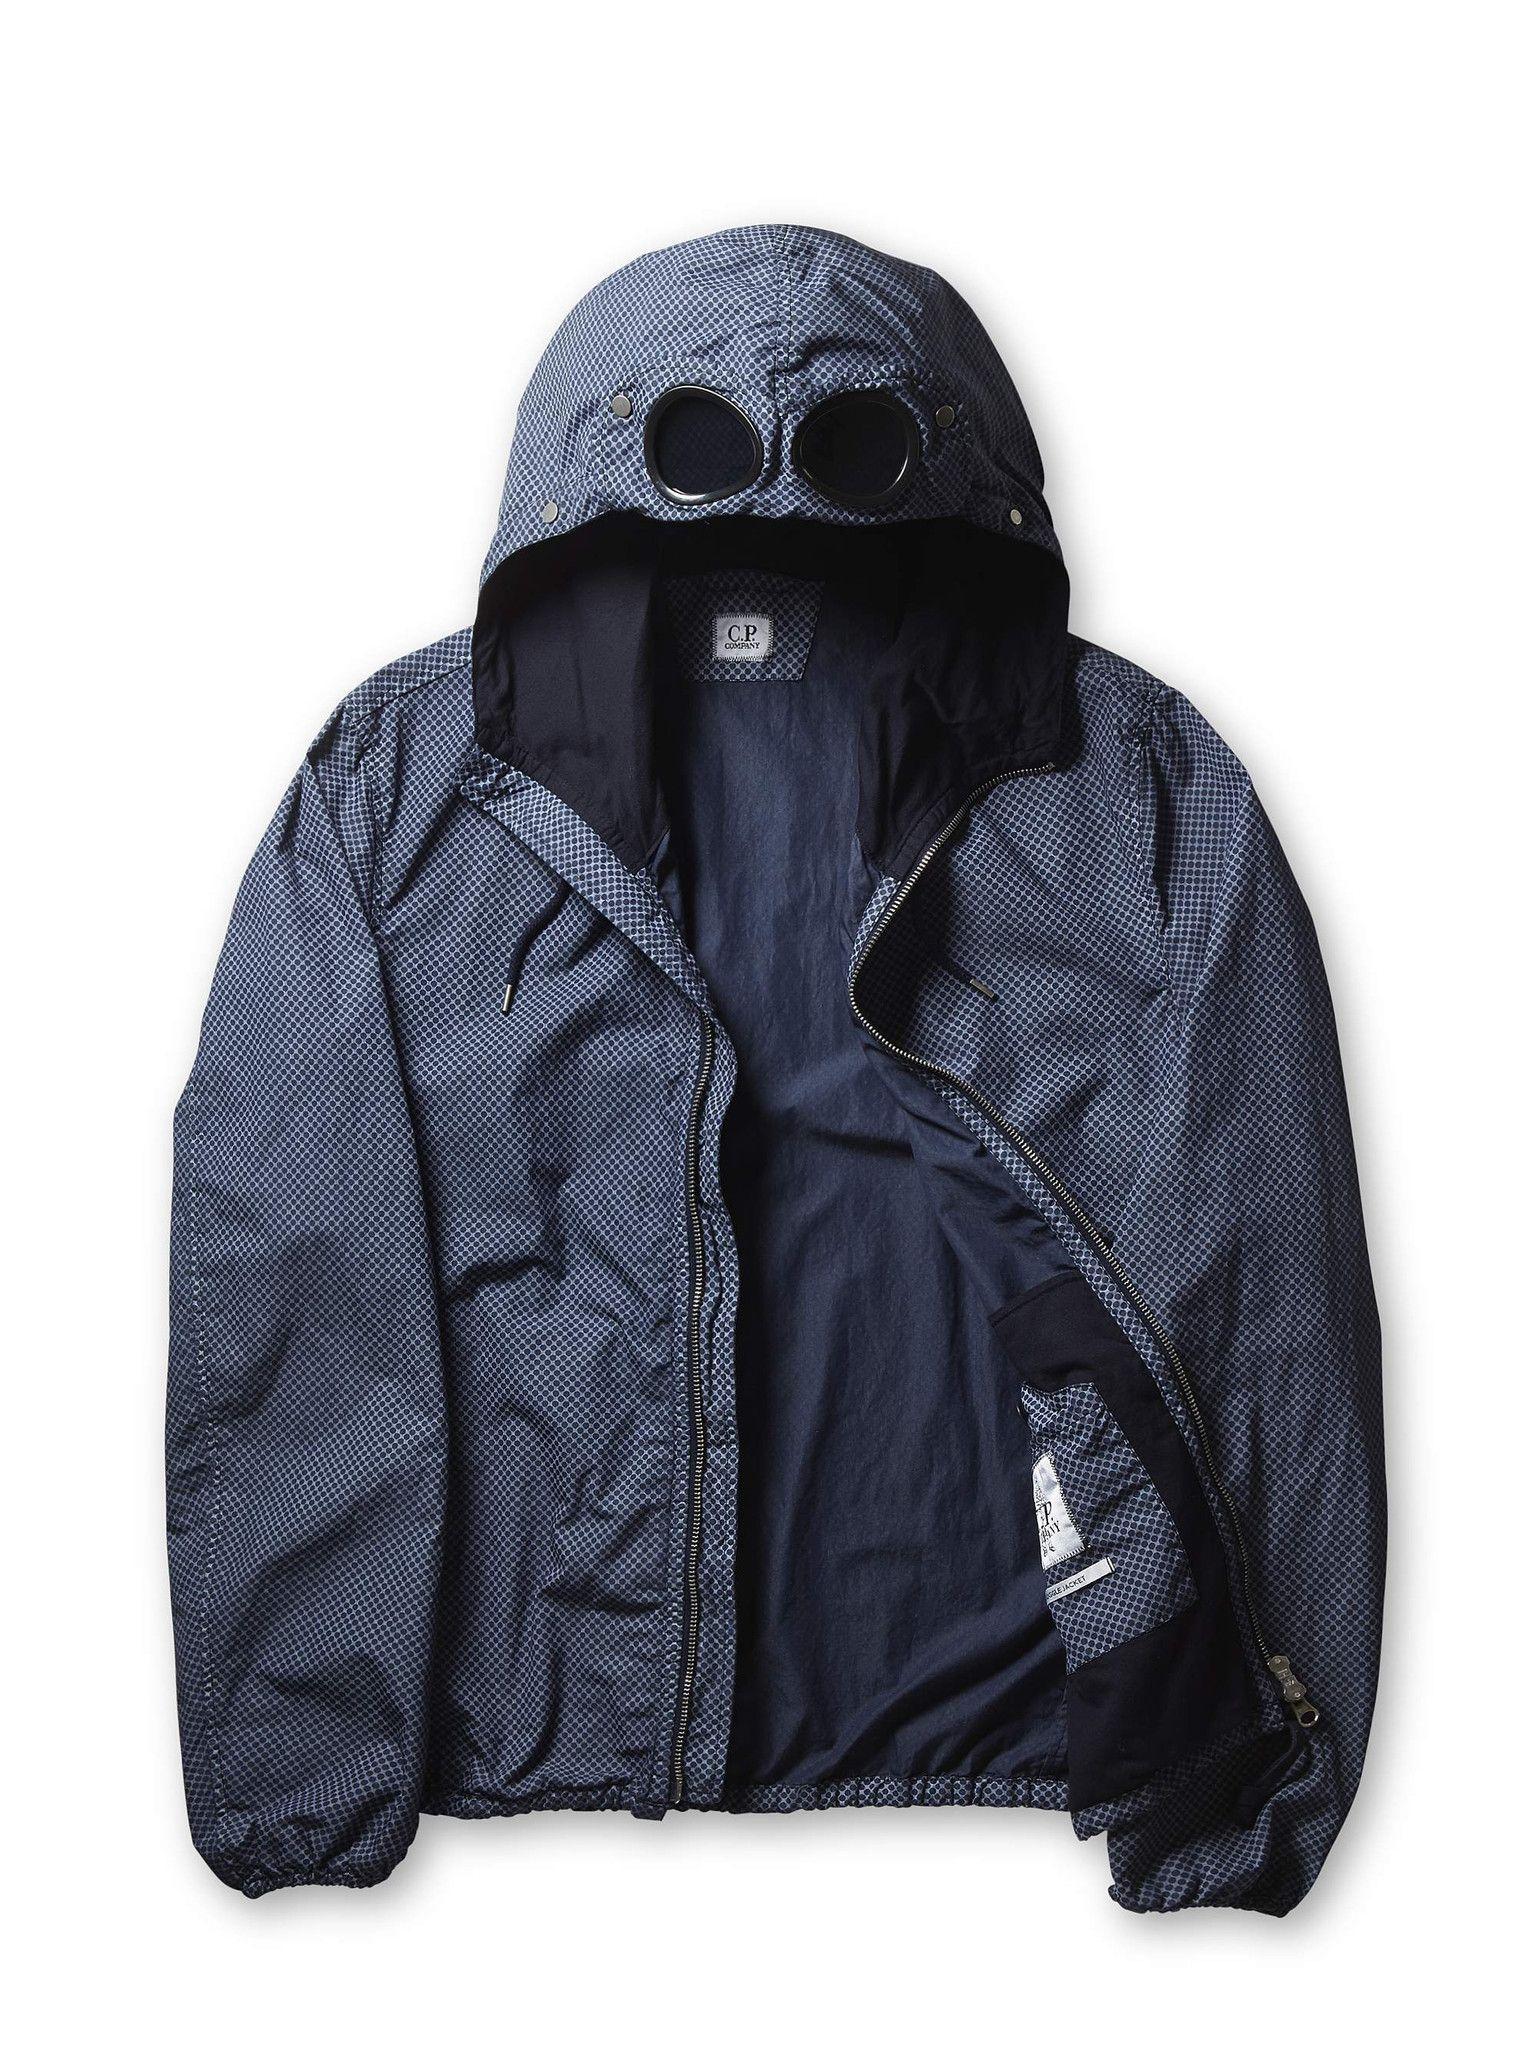 CP Company techwear